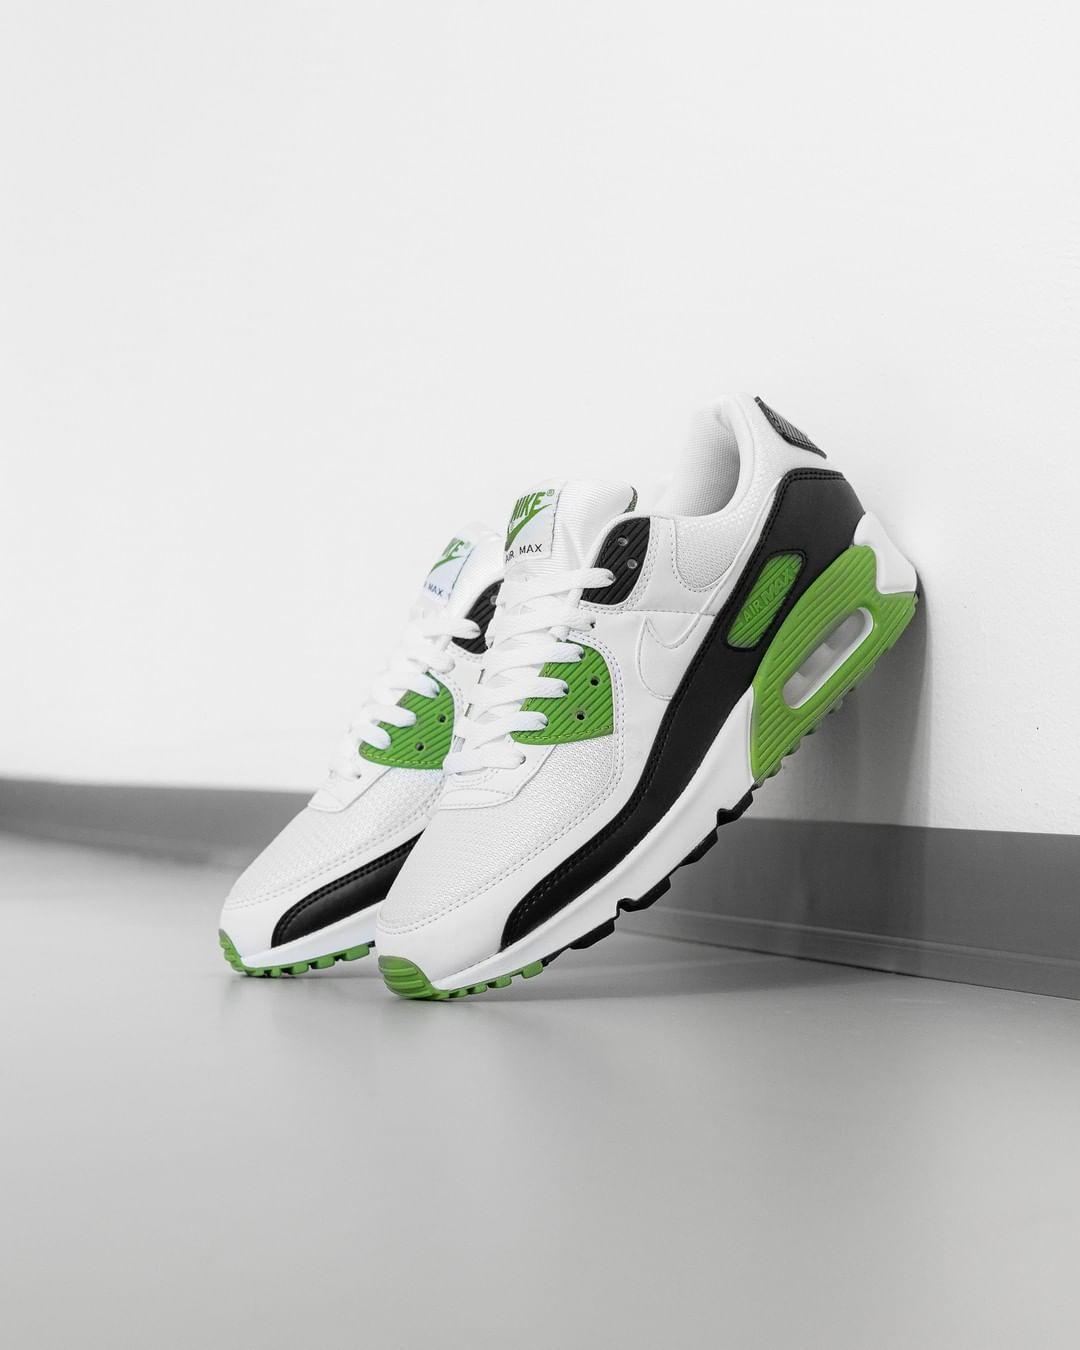 de.store Nike Running Nike Air Max 90 Herren's Schuhe Weiß